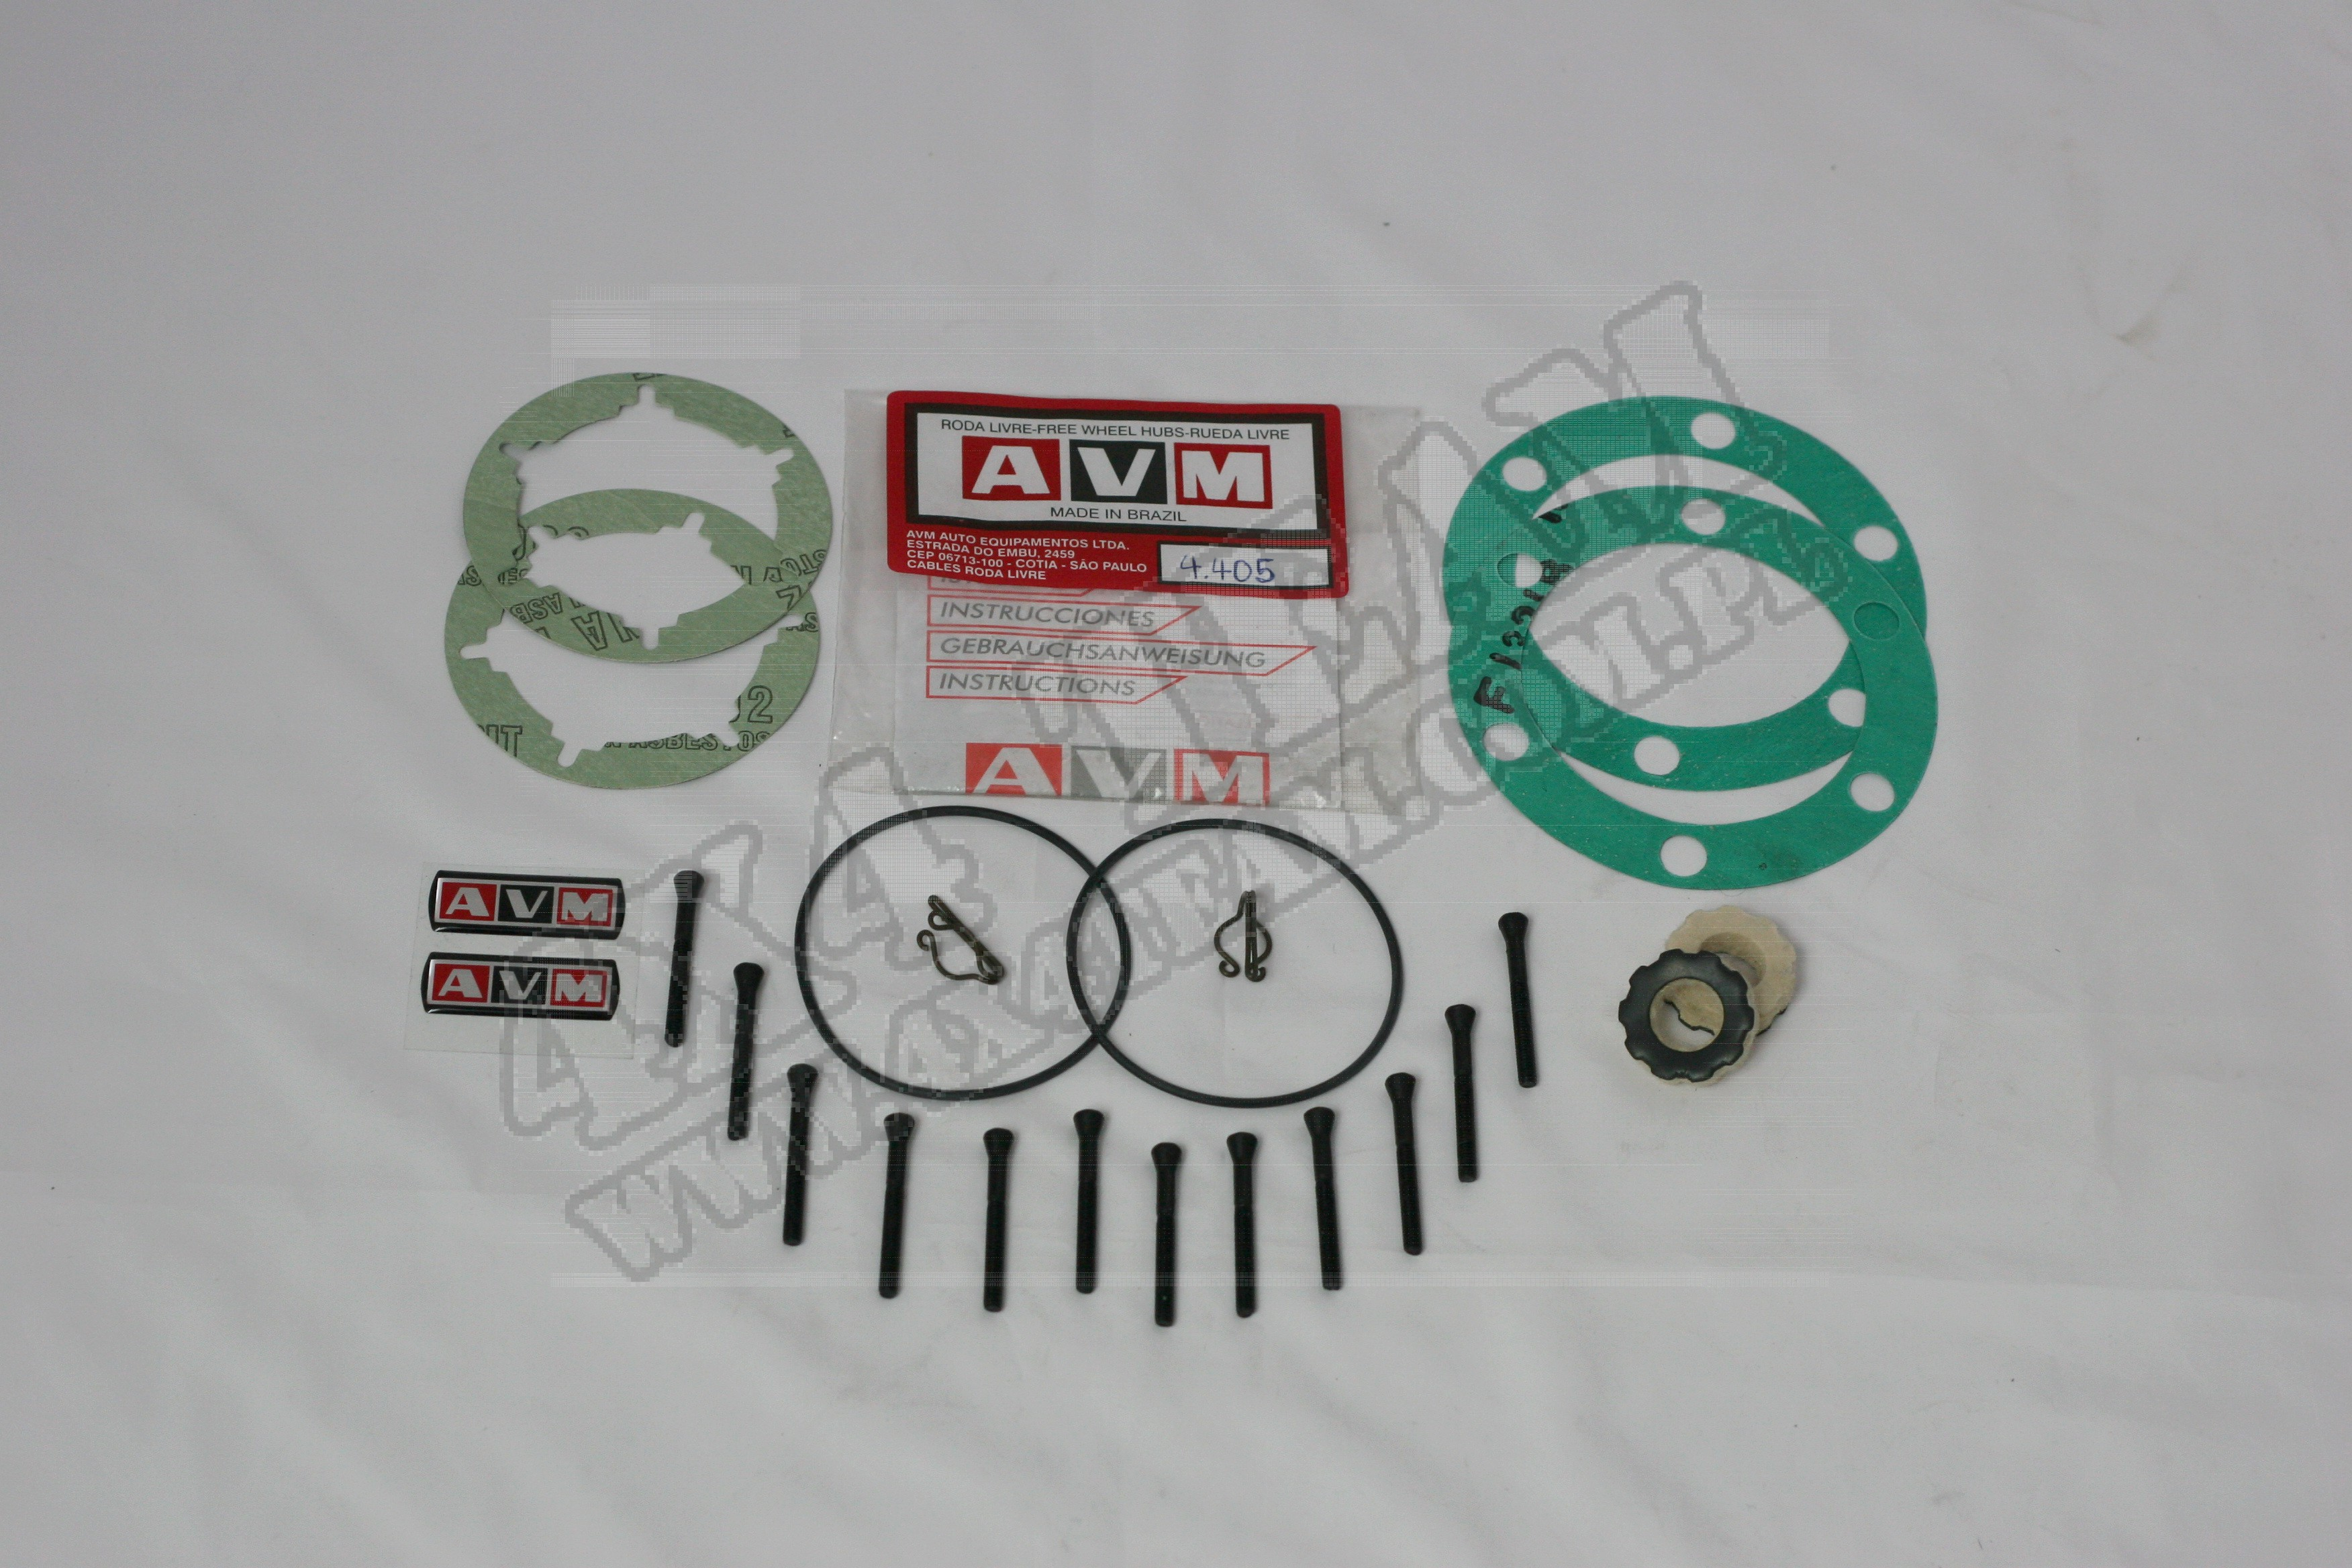 Zestaw serwisowy AVM 4.405